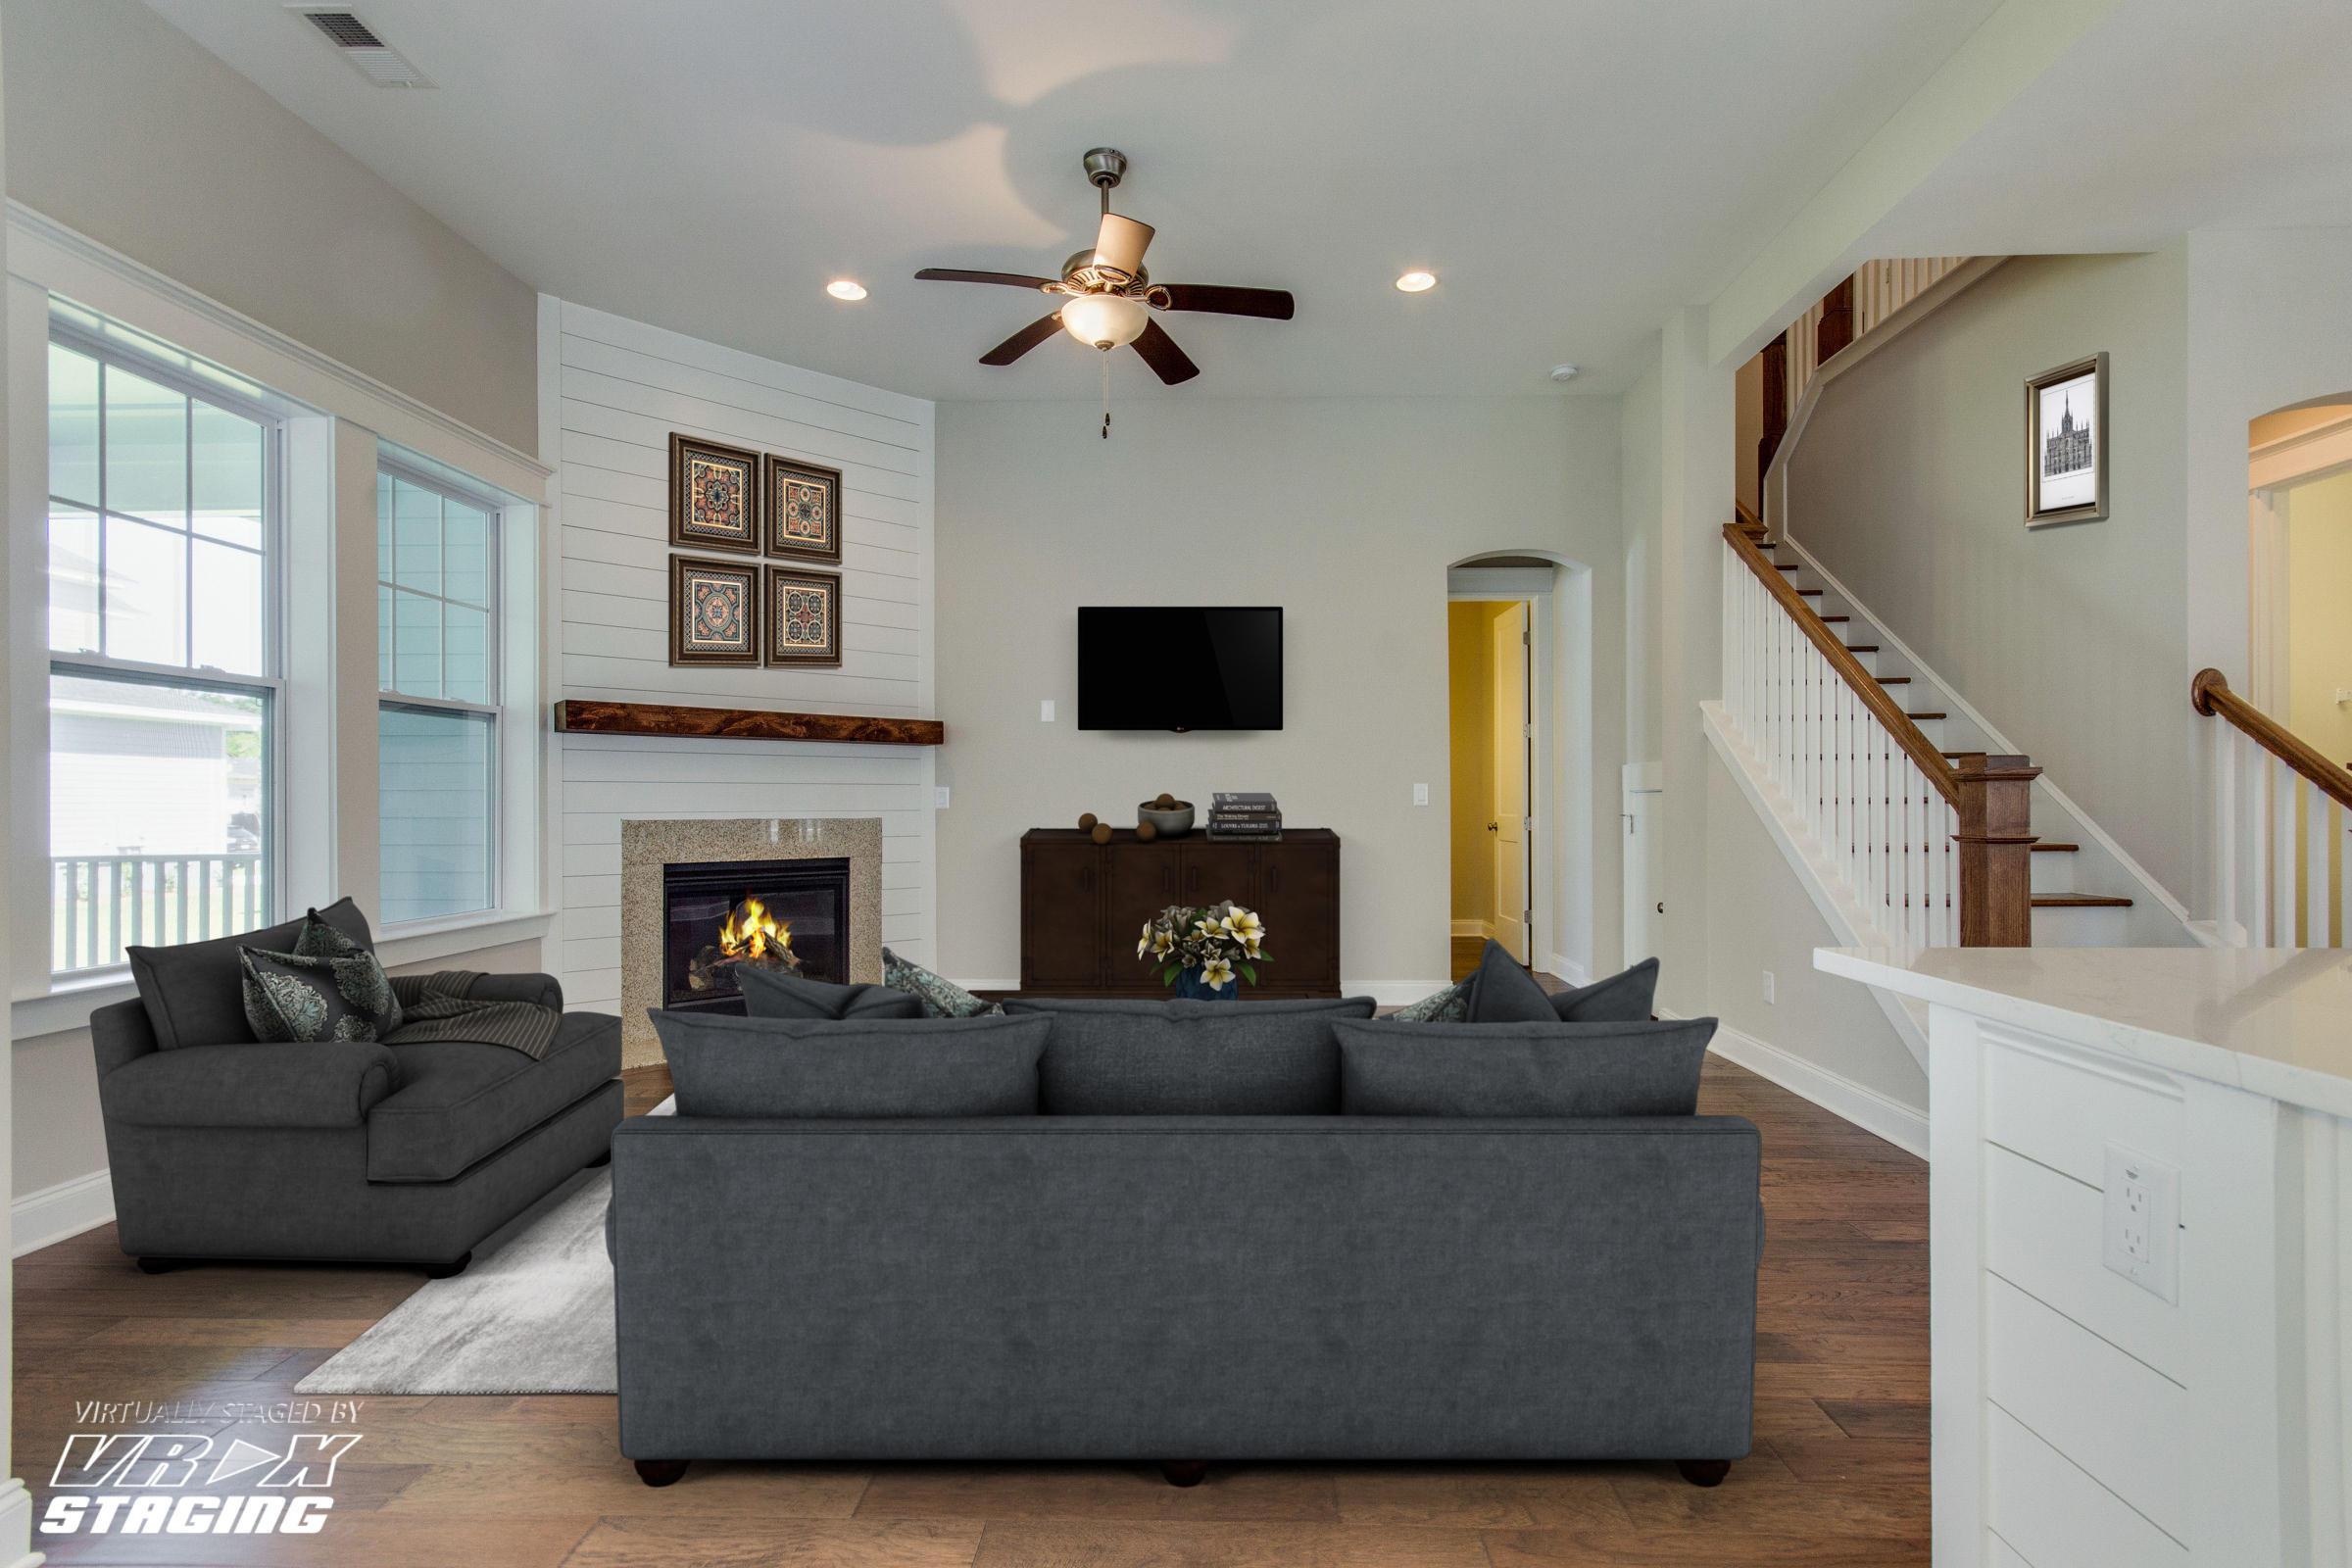 Carolina Park Homes For Sale - 1583 Old Rivers Gate, Mount Pleasant, SC - 41